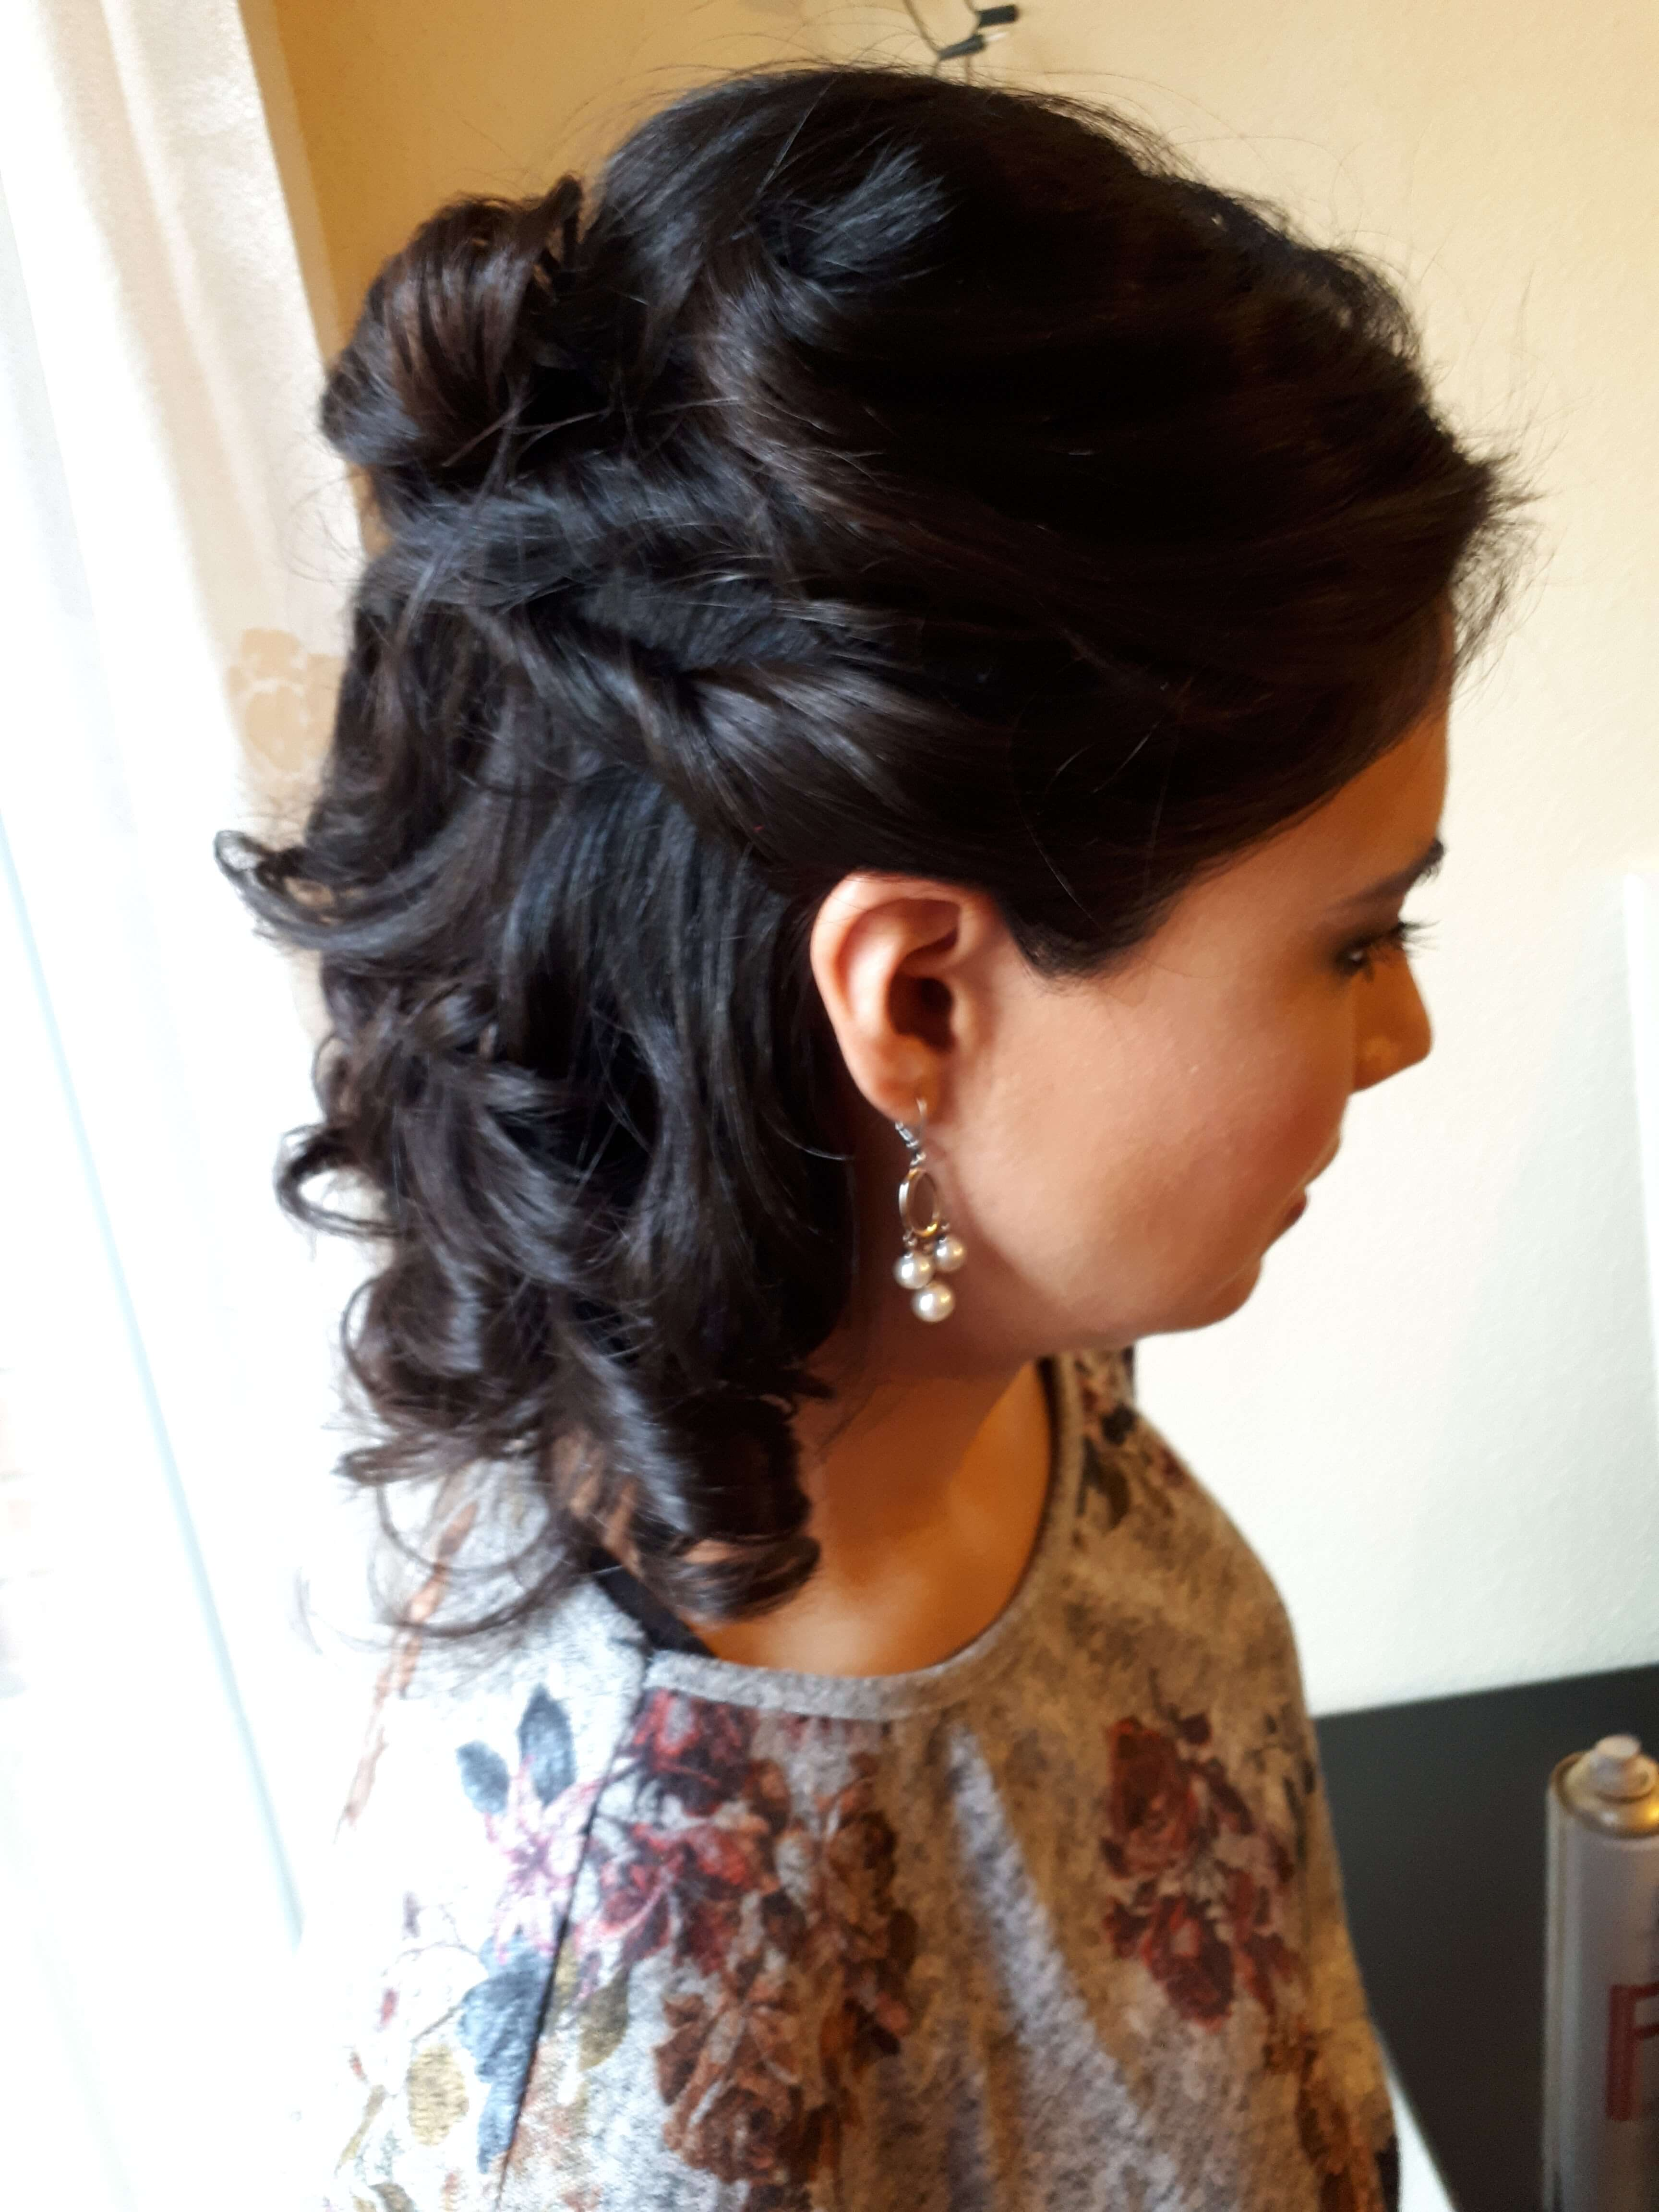 prueba-maquillaje-peinado-novia-media-melena-5